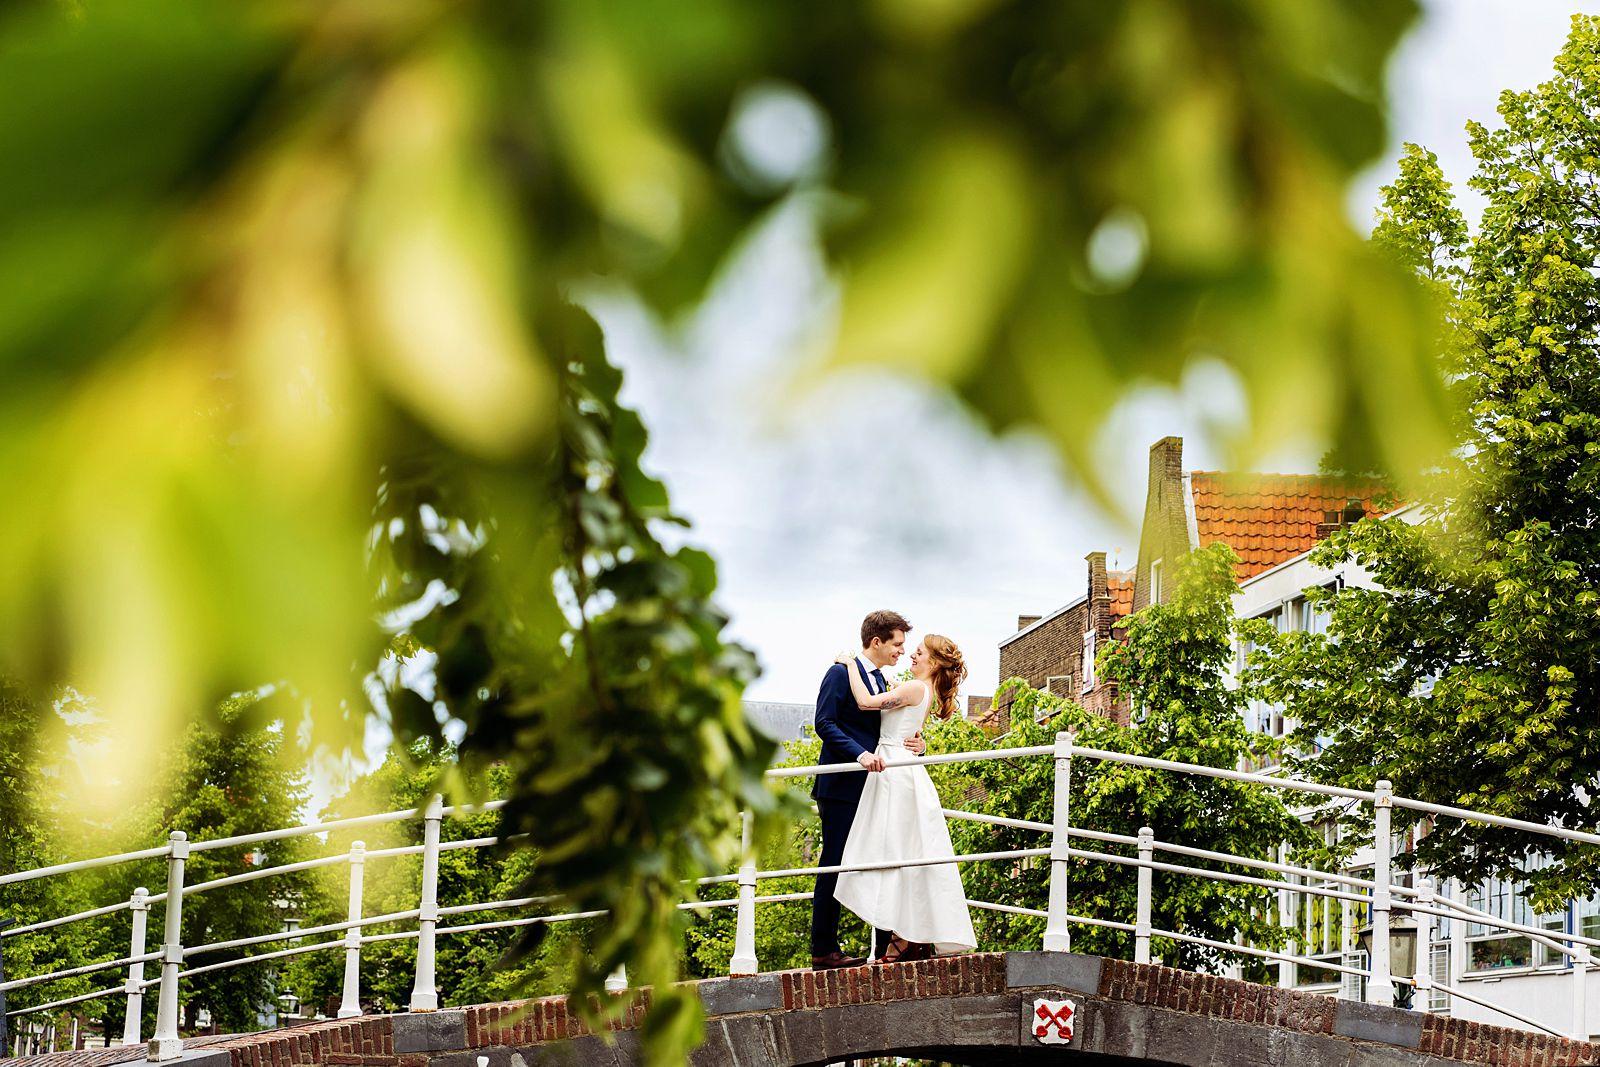 RUUDC Fotograaf kiezen, bruidsfotograaf kiezen, trouwfotograaf kiezen, trouwfotograaf kosten, bruidsfotograaf kosten, bruidsfotograaf kiezen, trouwfotograaf kiezen, hoe kies ik een trouwfotograaf, hoe kies ik een bruidsfotograaf, hoeveel kost een trouwfotograaf, hoeveel kost een bruidsfotograaf, bruidsfotografie tarieven, trouwfoto tarieven, wat kost een bruidsfotograaf, kosten, wat kost een trouwfotograaf, destination wedding fotograaf, wereldwijd fotograaf, fotograaf internationaal, hoe kies ik een fotograaf voor mijn bruiloft